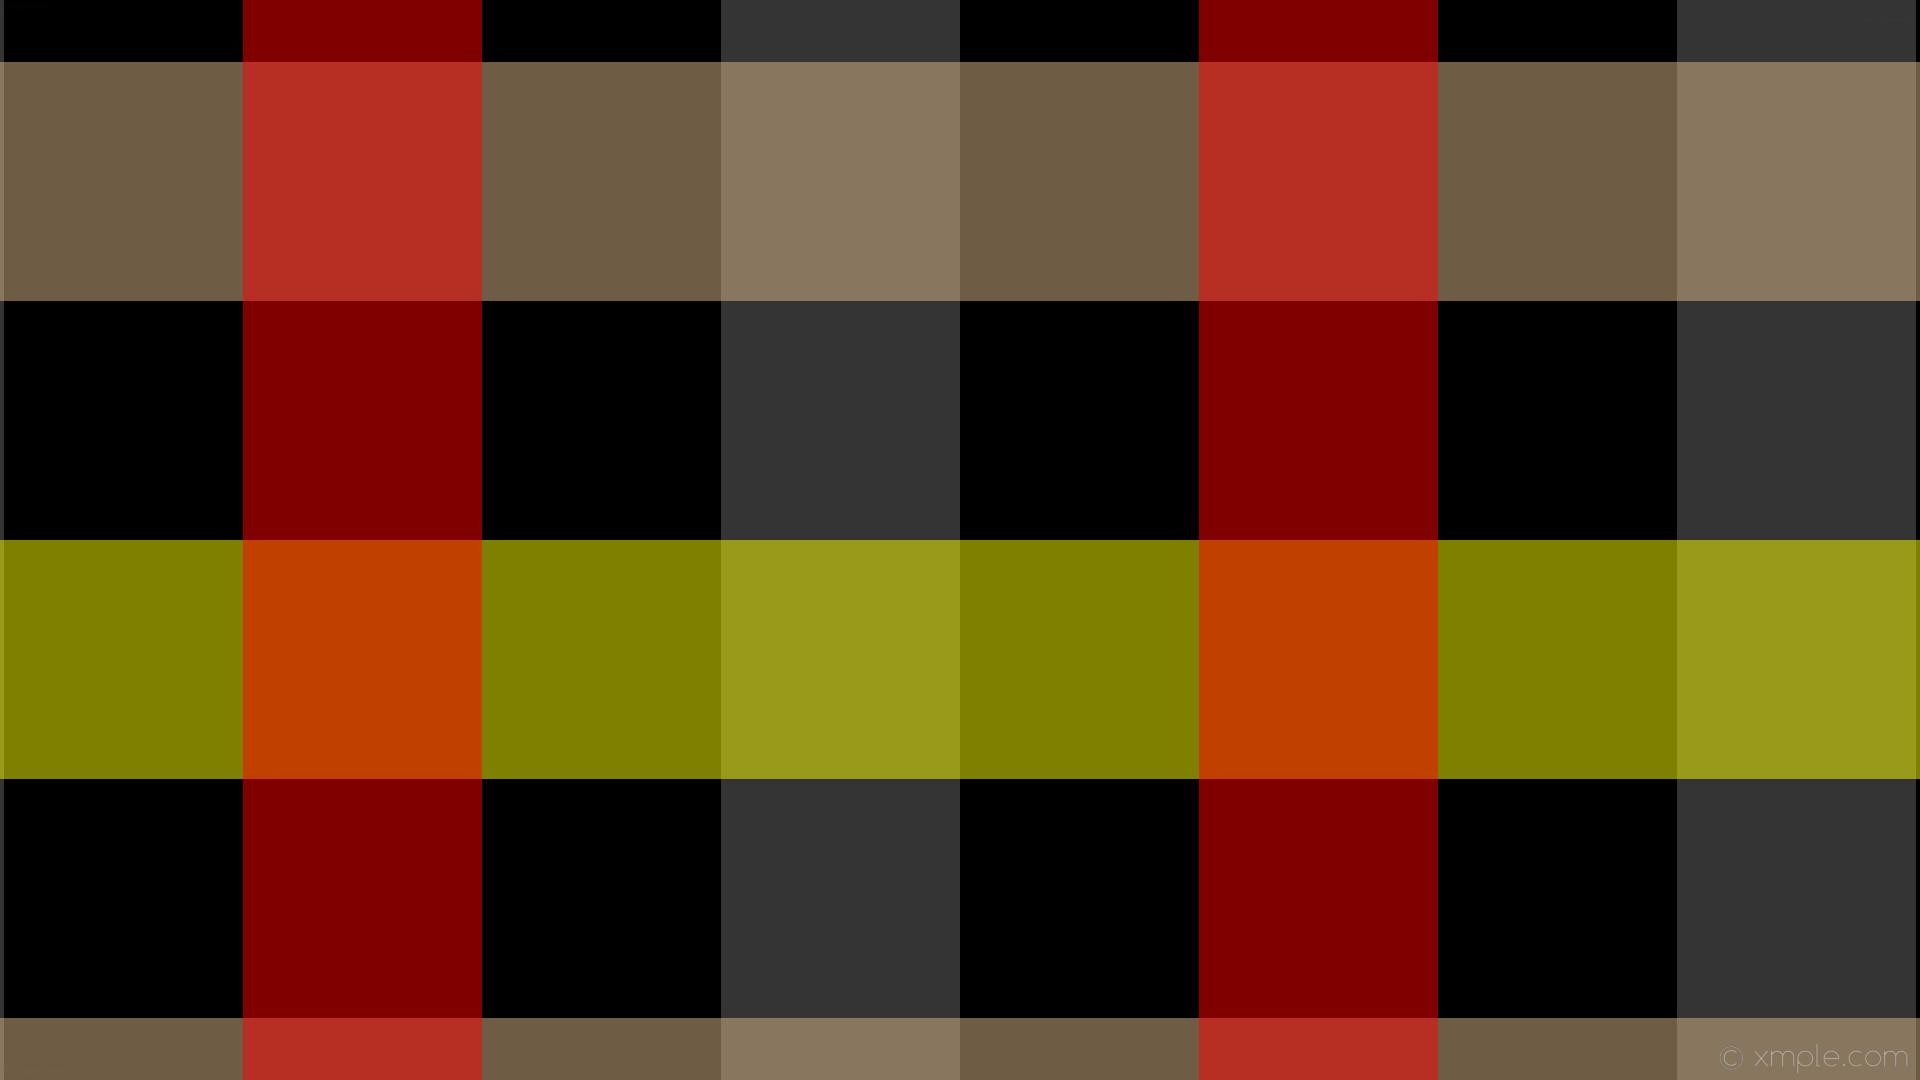 wallpaper grey penta red striped brown gingham black yellow dim gray burly  wood #000000 #